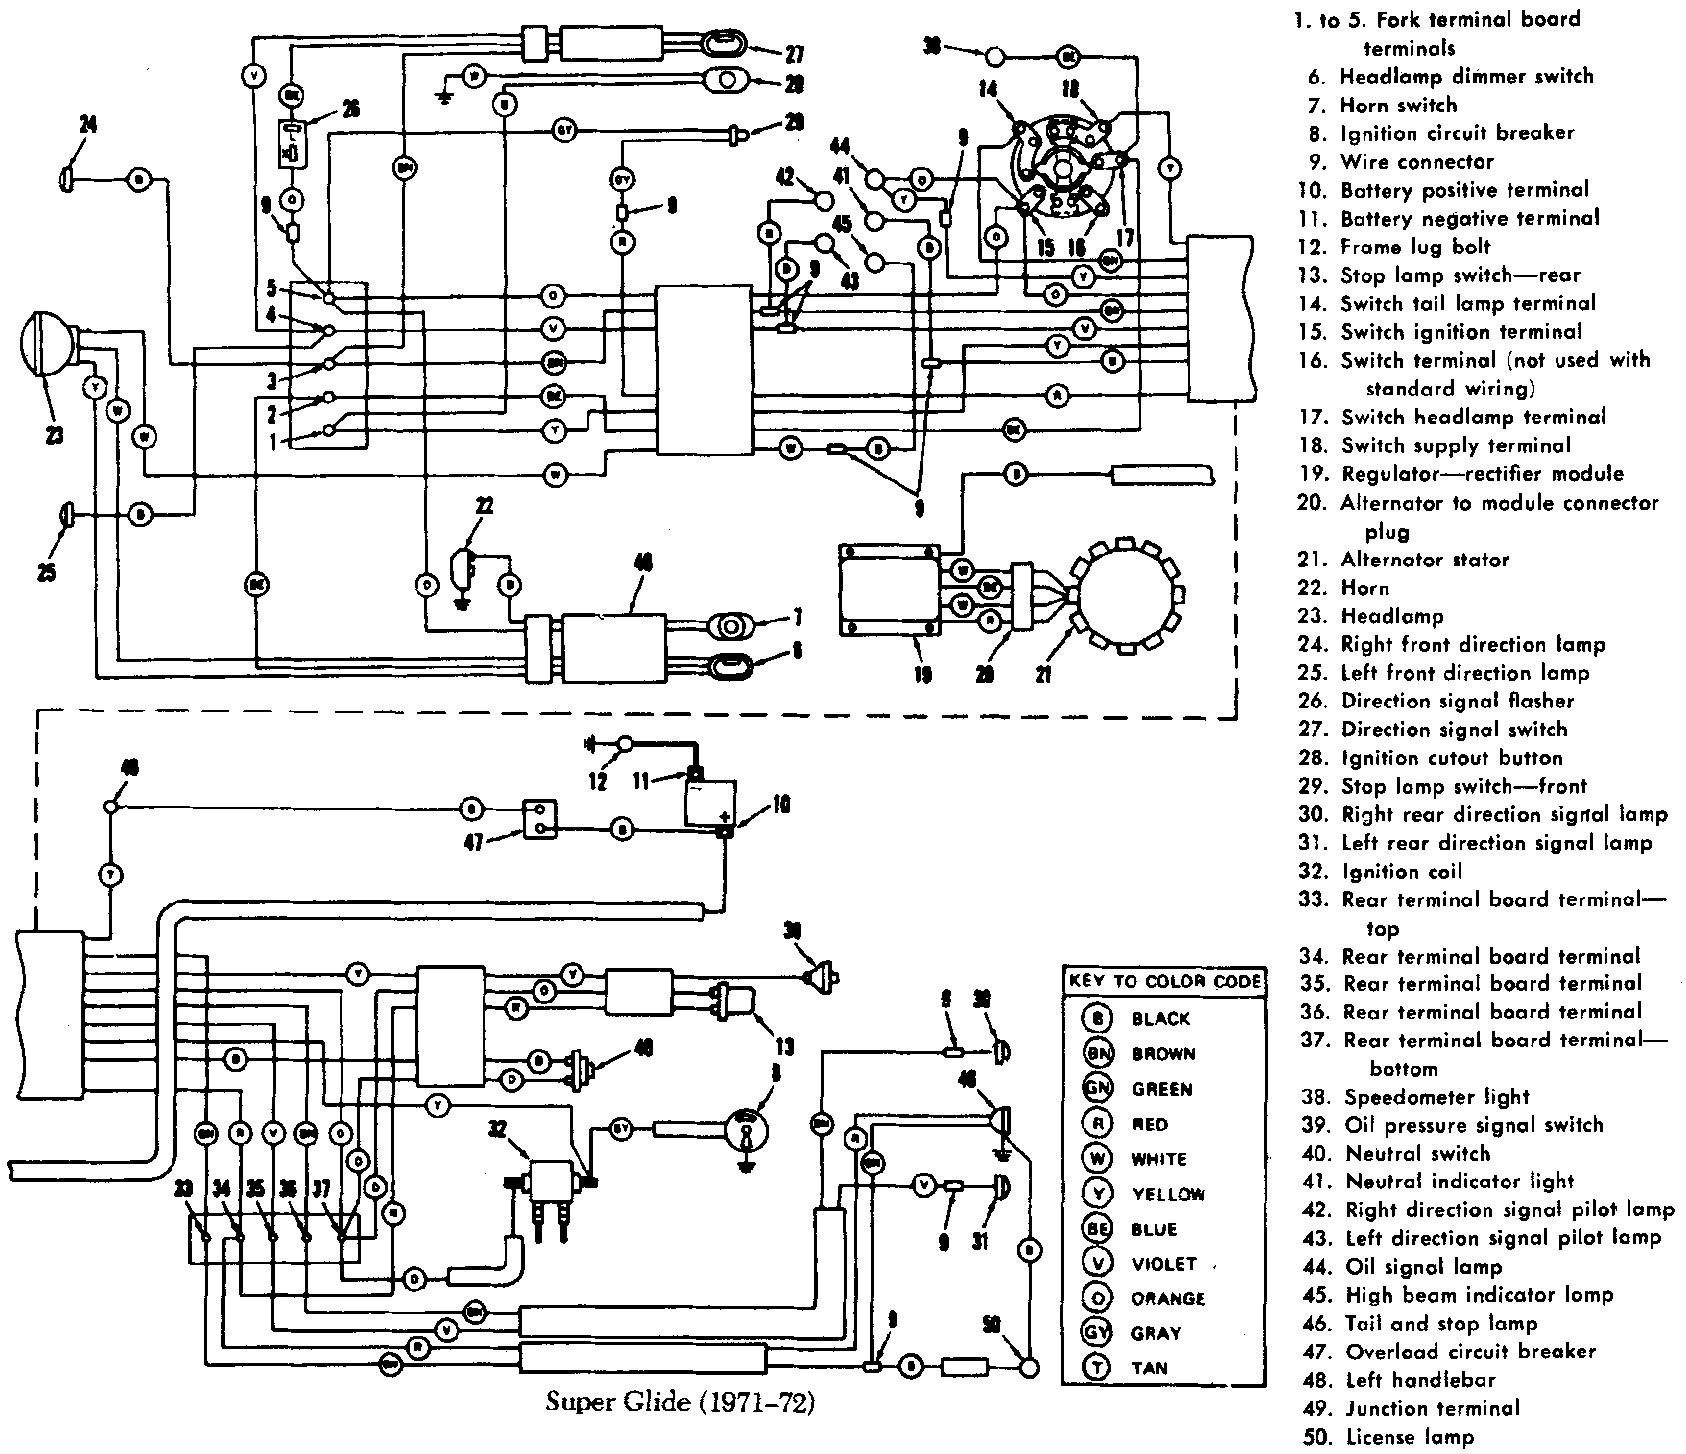 hight resolution of 1982 harley davidson sportster wiring diagram wiring diagram imagerh mainetreasurechest com design